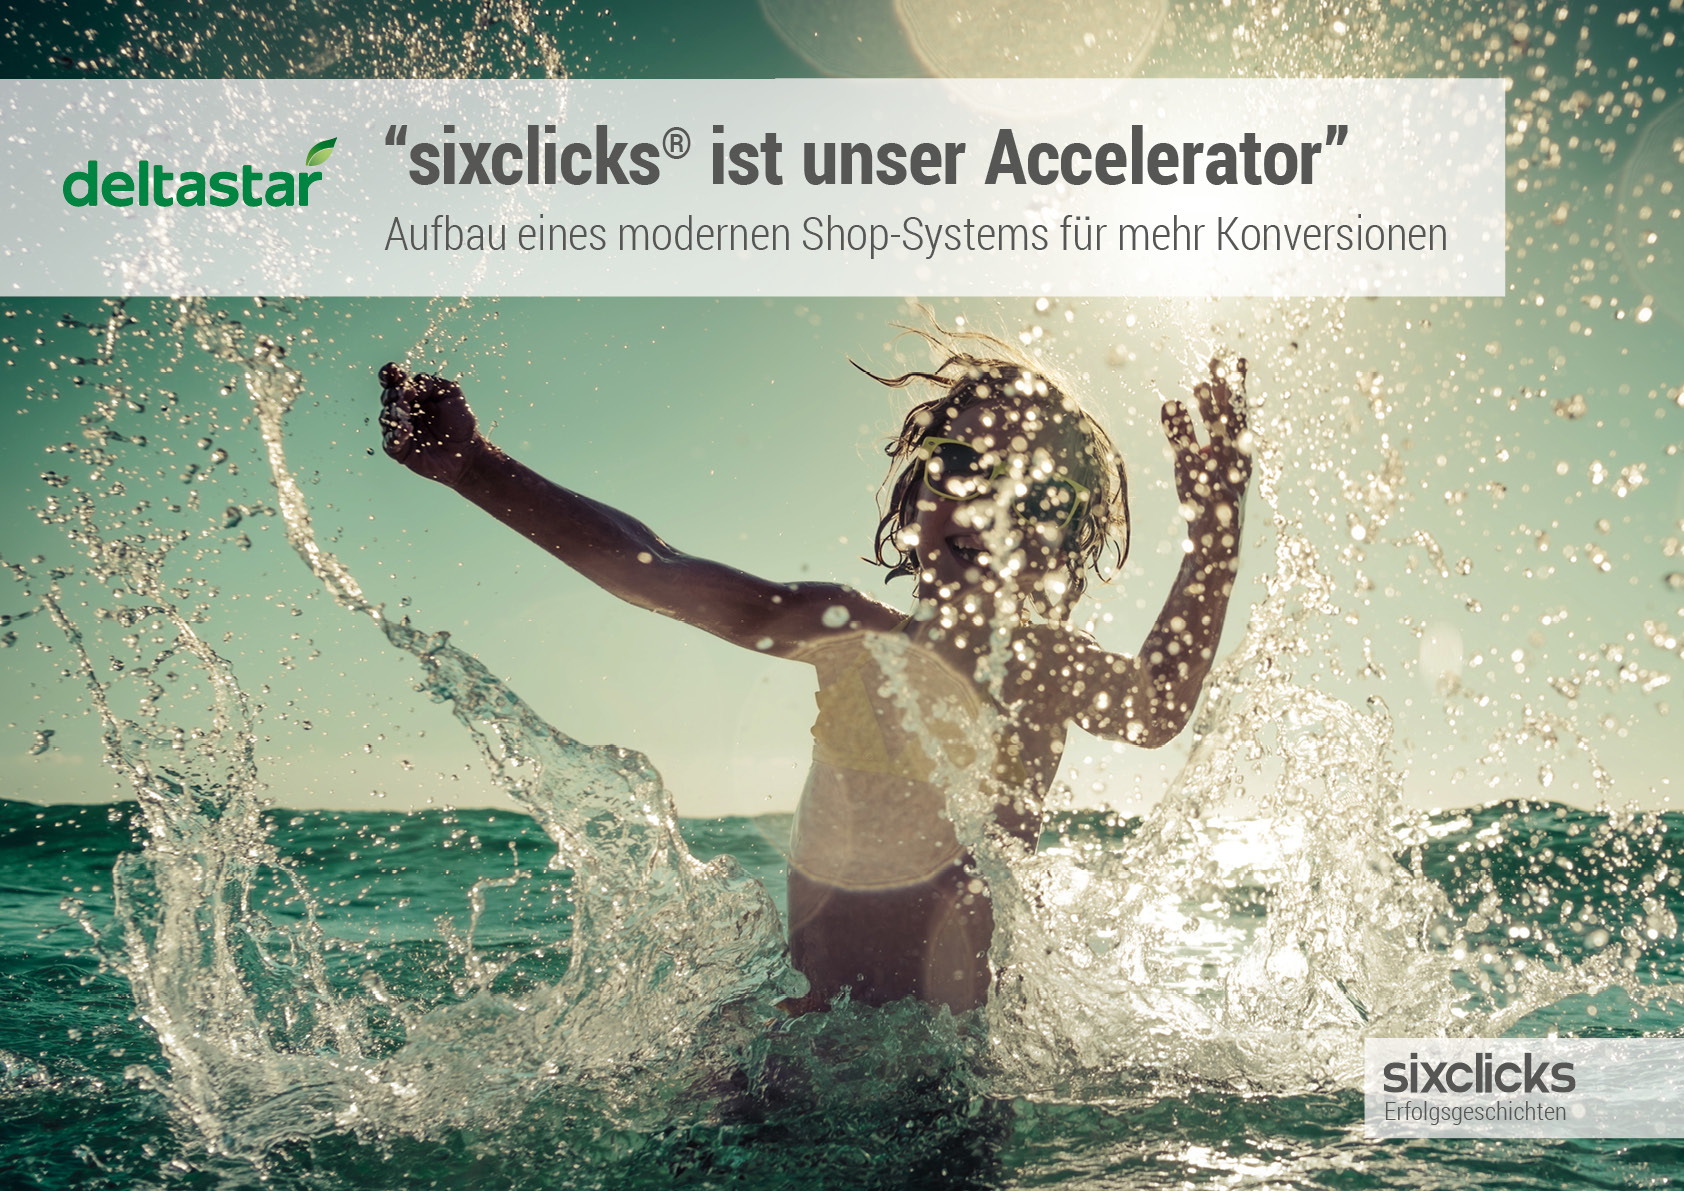 Deltastar Erfolgsgeschichte - eCommerce mit modernem Shop-System